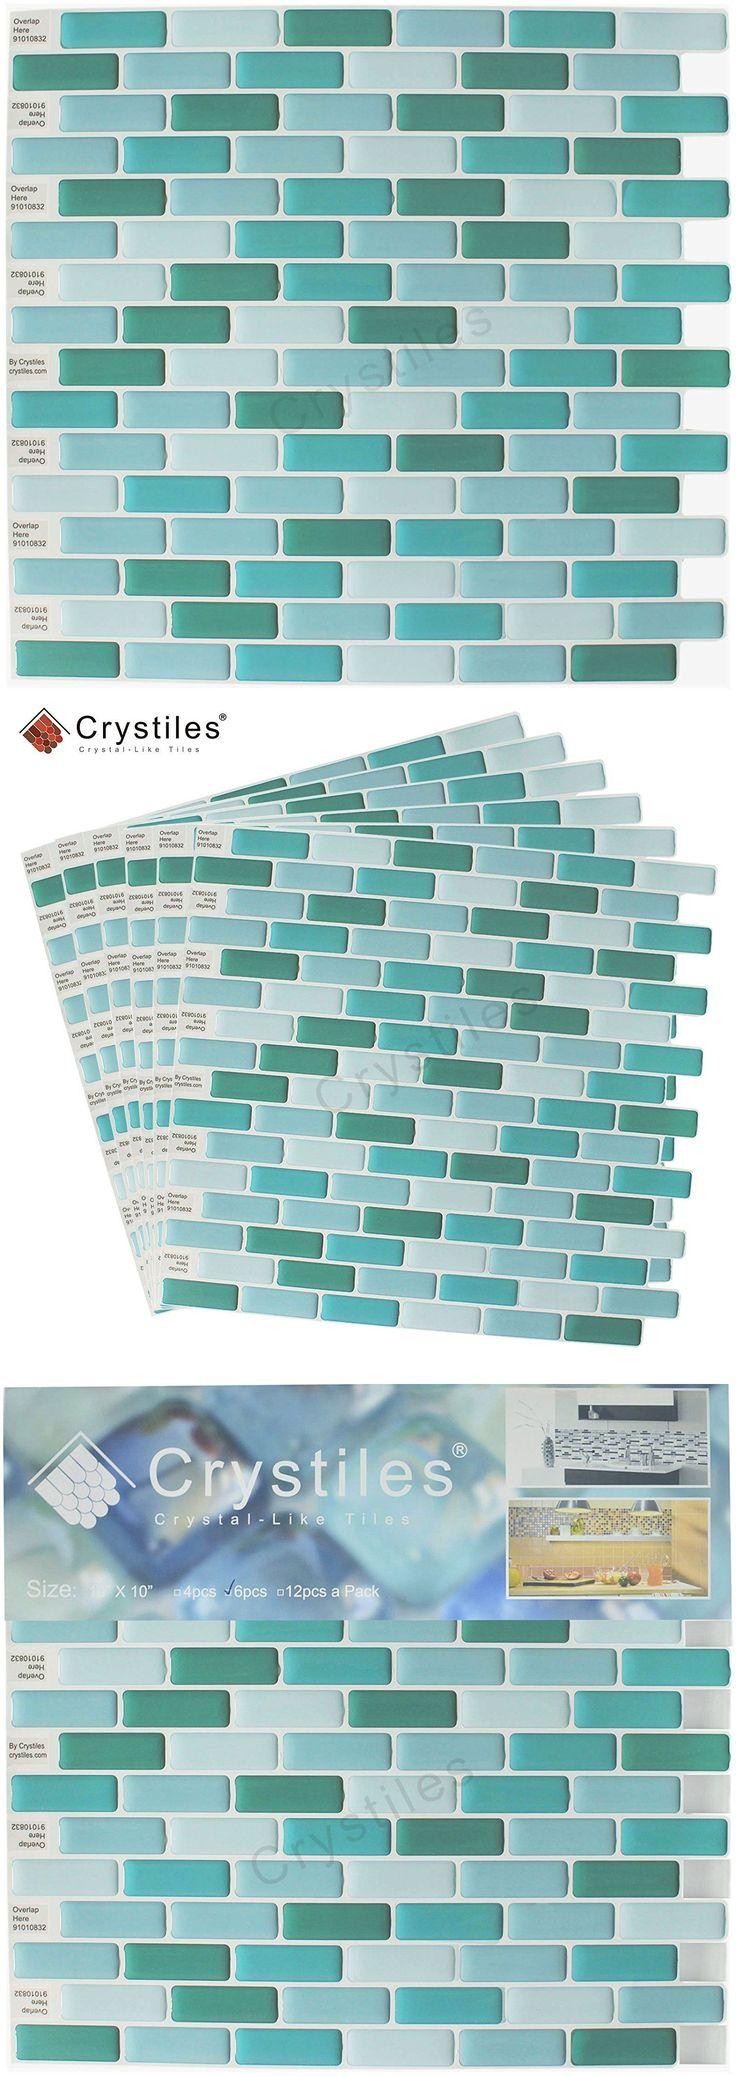 Floor and Wall Tiles 45800: Self Adhesive Wall Tiles Peel And Stick Kitchen Bathroom Backsplash Vinyl 10 X 10 -> BUY IT NOW ONLY: $47.99 on eBay!